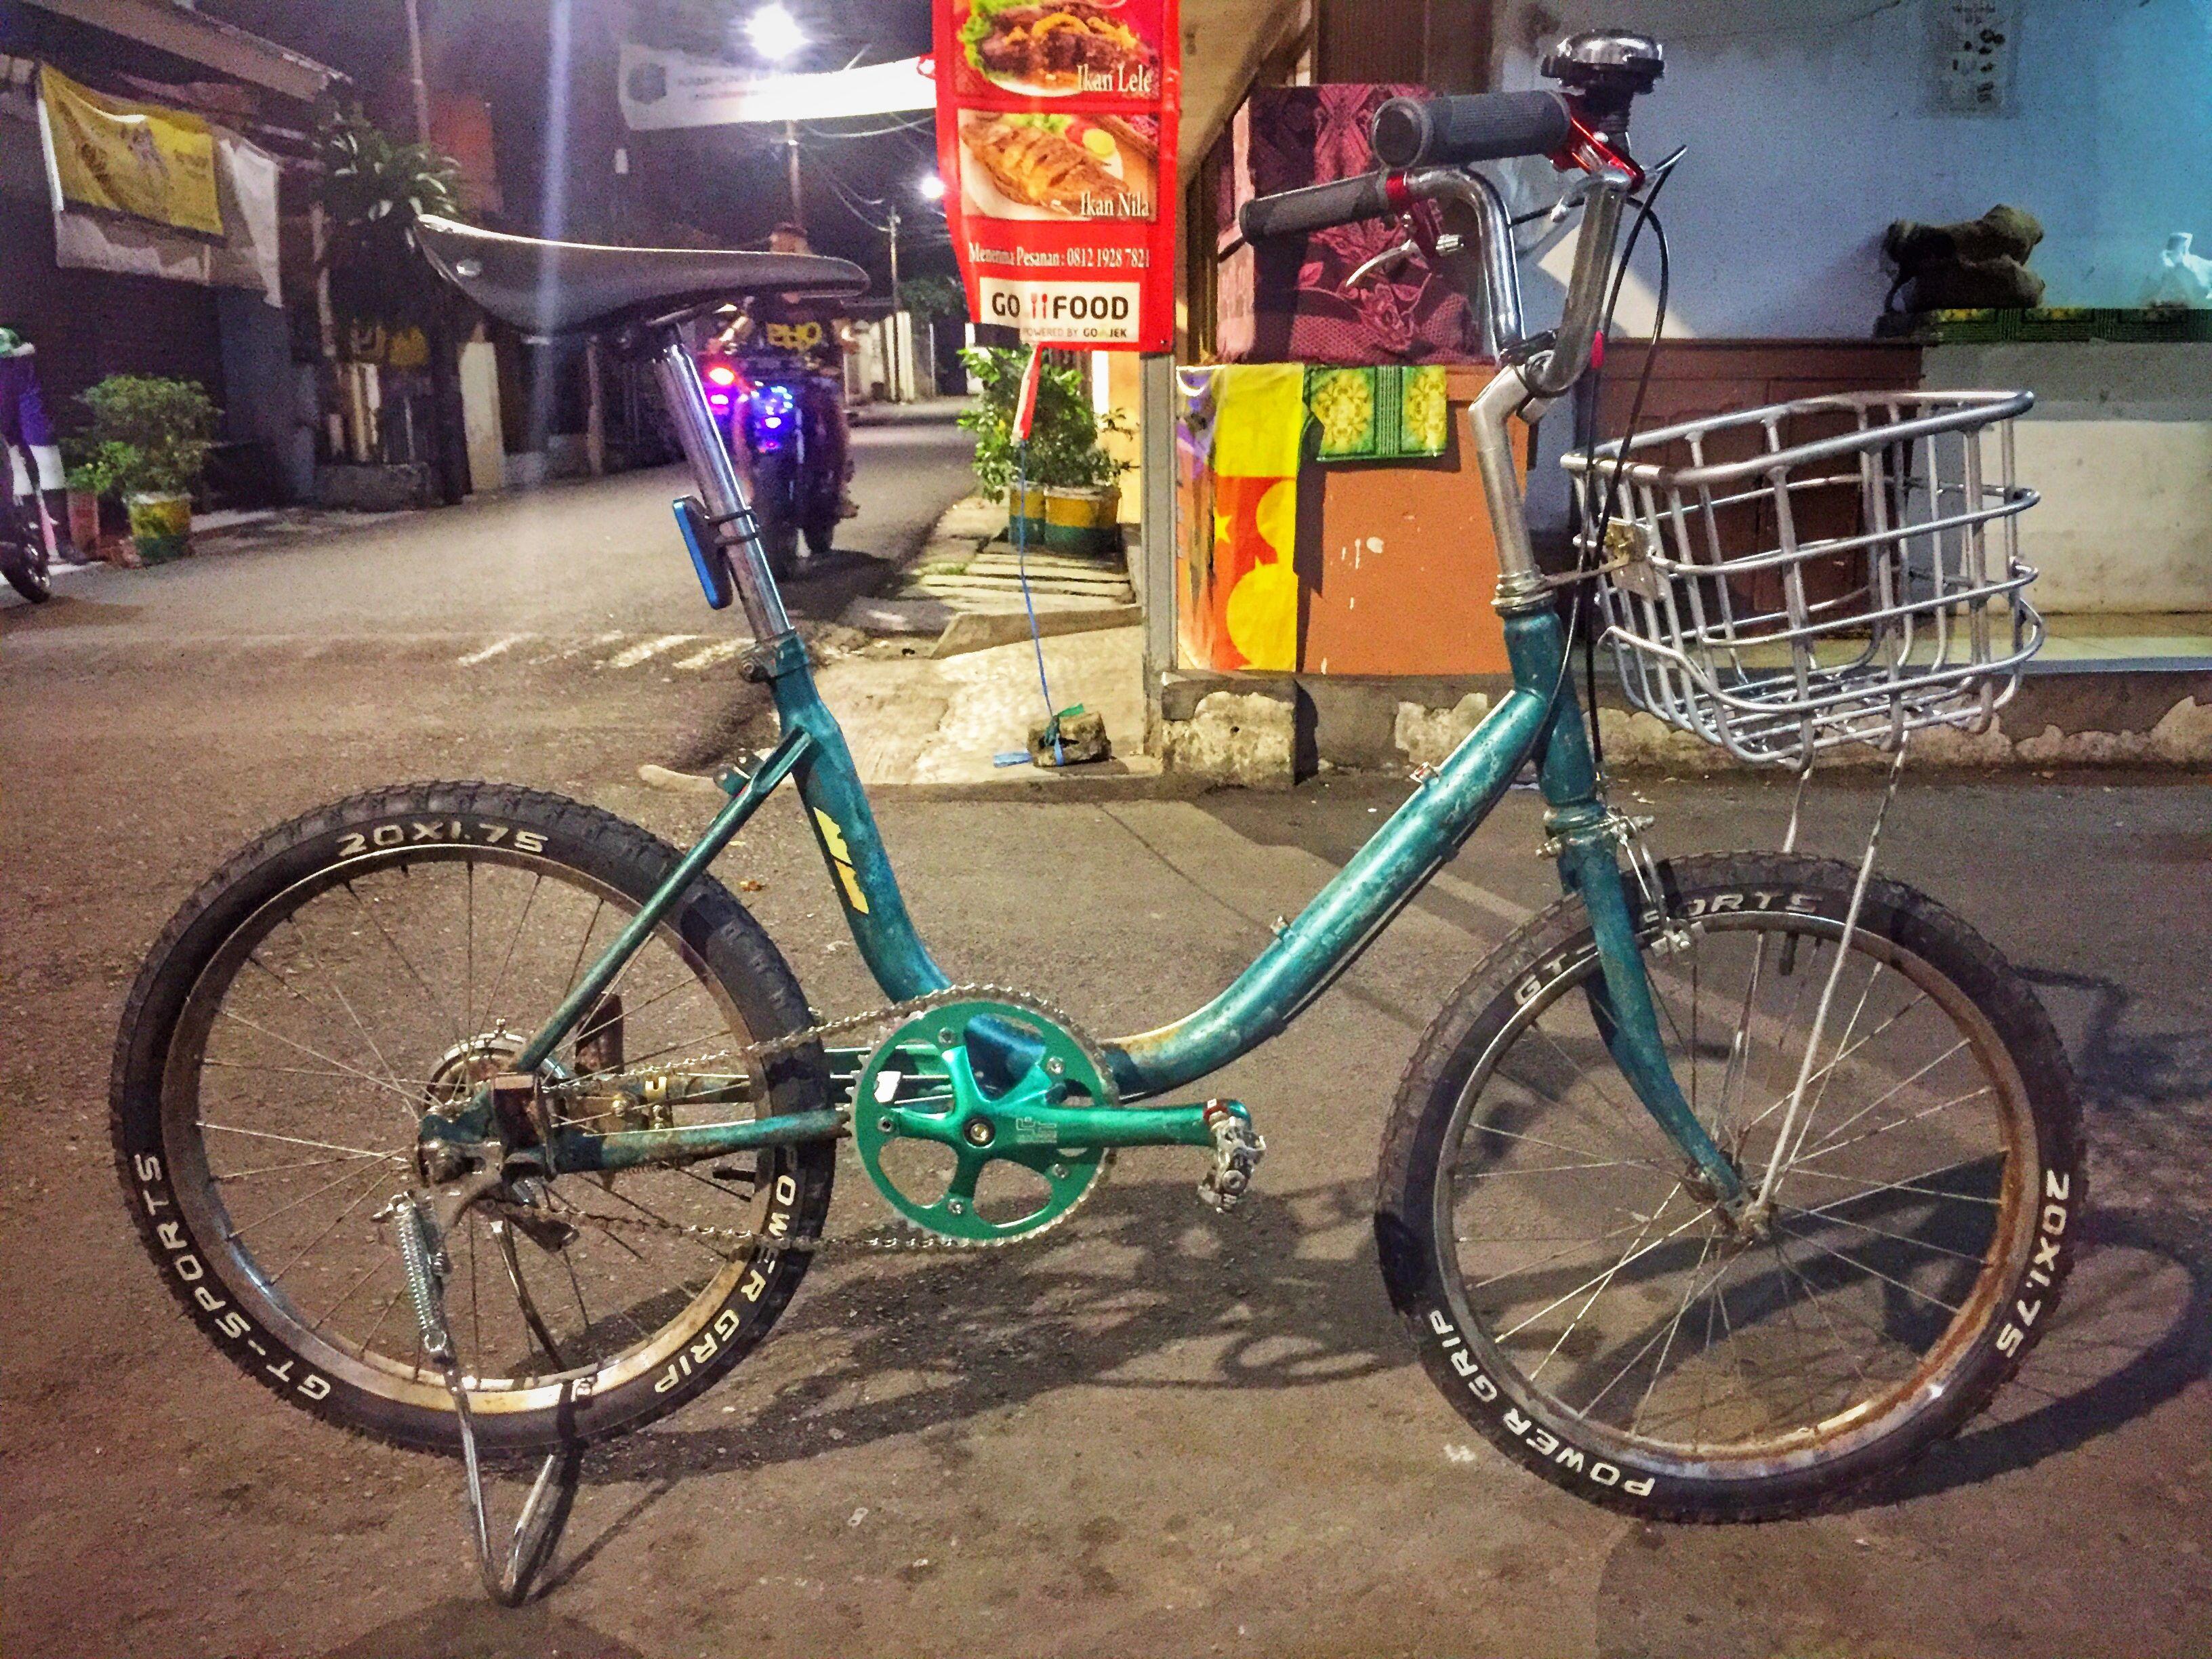 Pin Oleh Asahabuddin Gowesterus Di Sepeda Mini Sepeda Fotografi